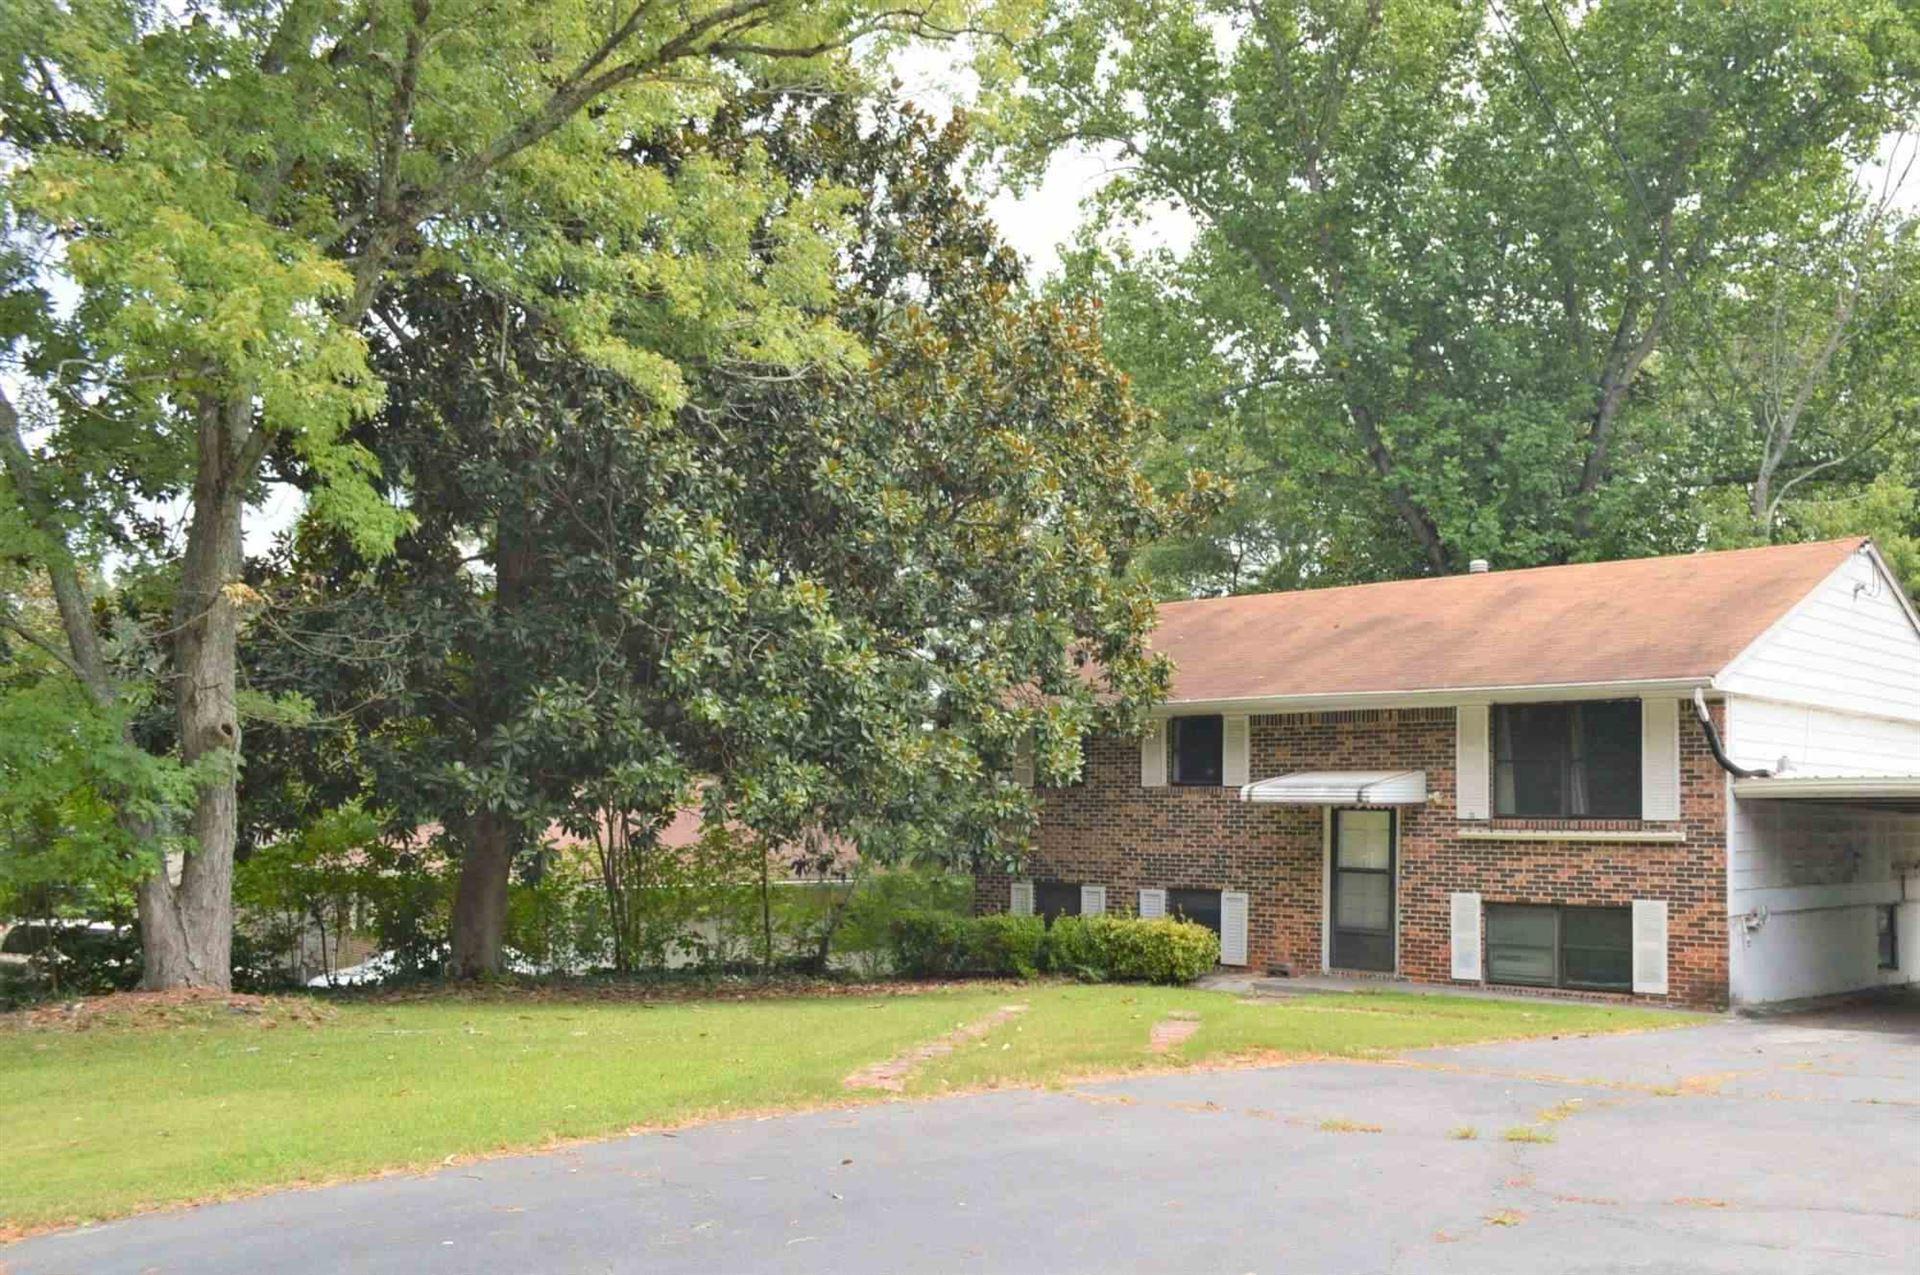 4154 Sweetbriar Ln, Forest Park, GA 30297 - #: 8853579